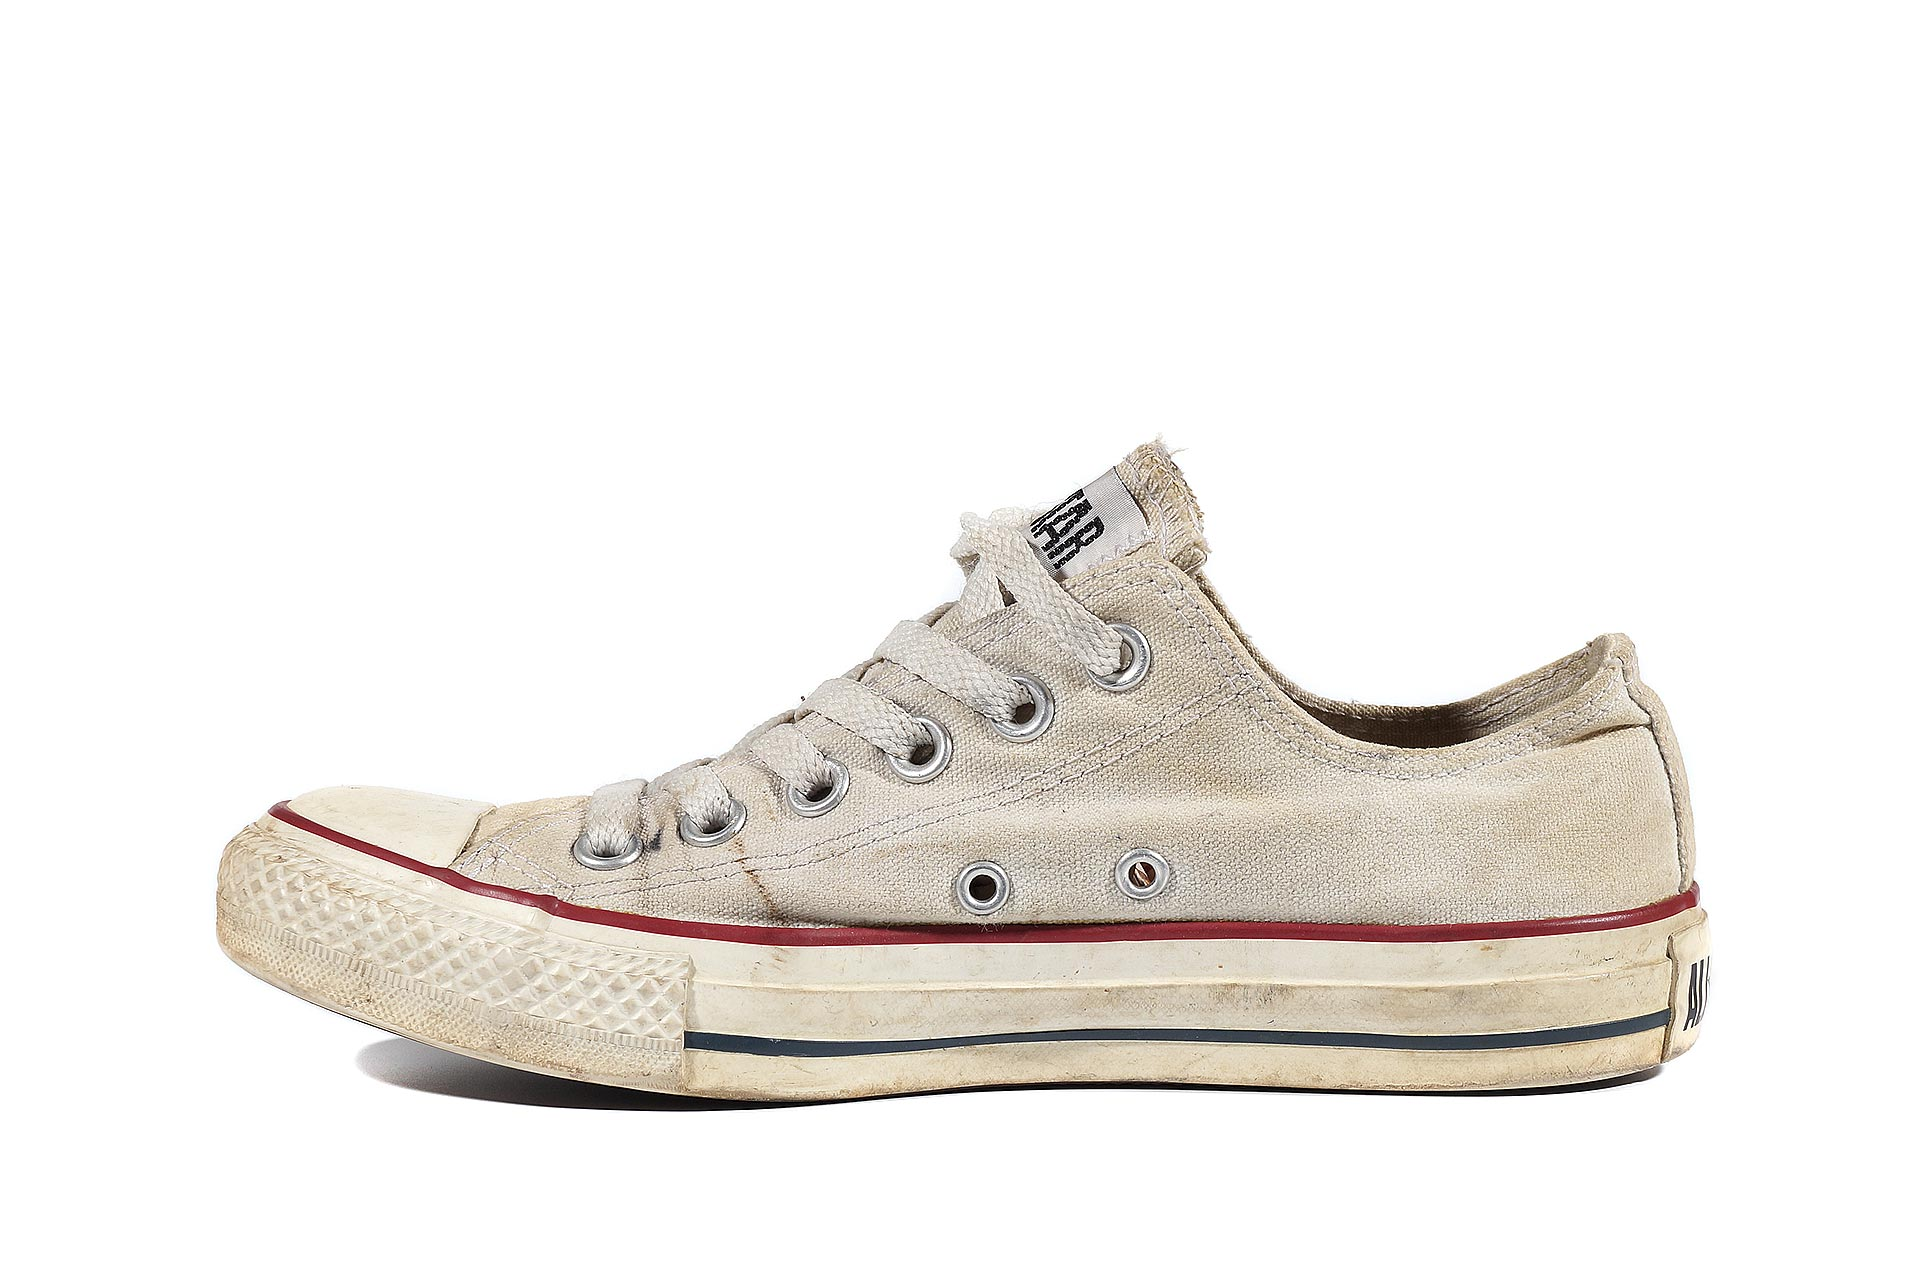 21133b82e4ea4c Converse Chuck Taylor All Star M7652 (00071-U) sneakers used buy online  shop vintageshoes.ru